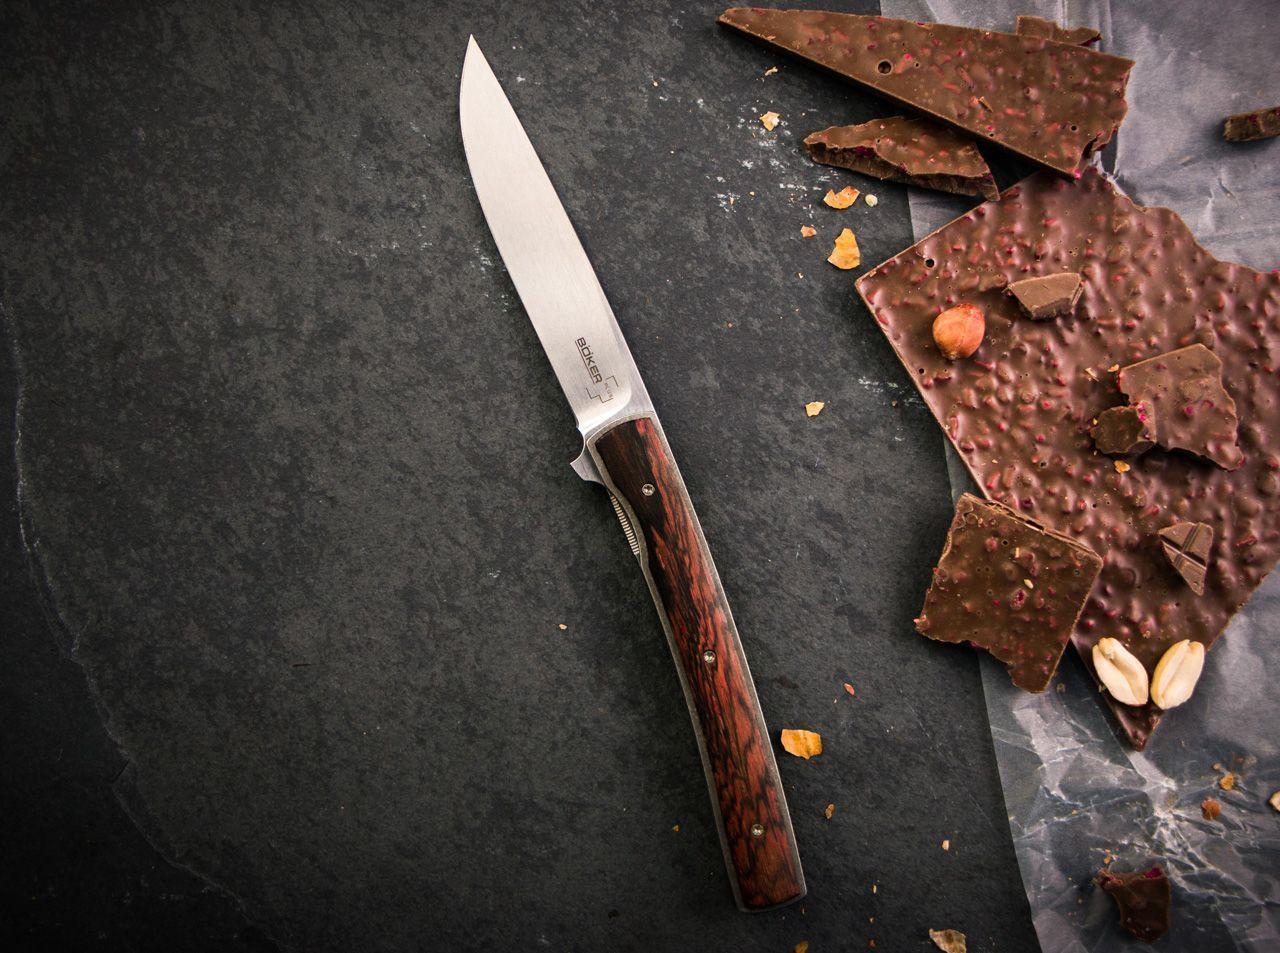 Фото 8 - Складной нож Boker Urban Trapper Gentleman Cocobolo Wood 01BO722, сталь VG-10, рукоять титан/дерево